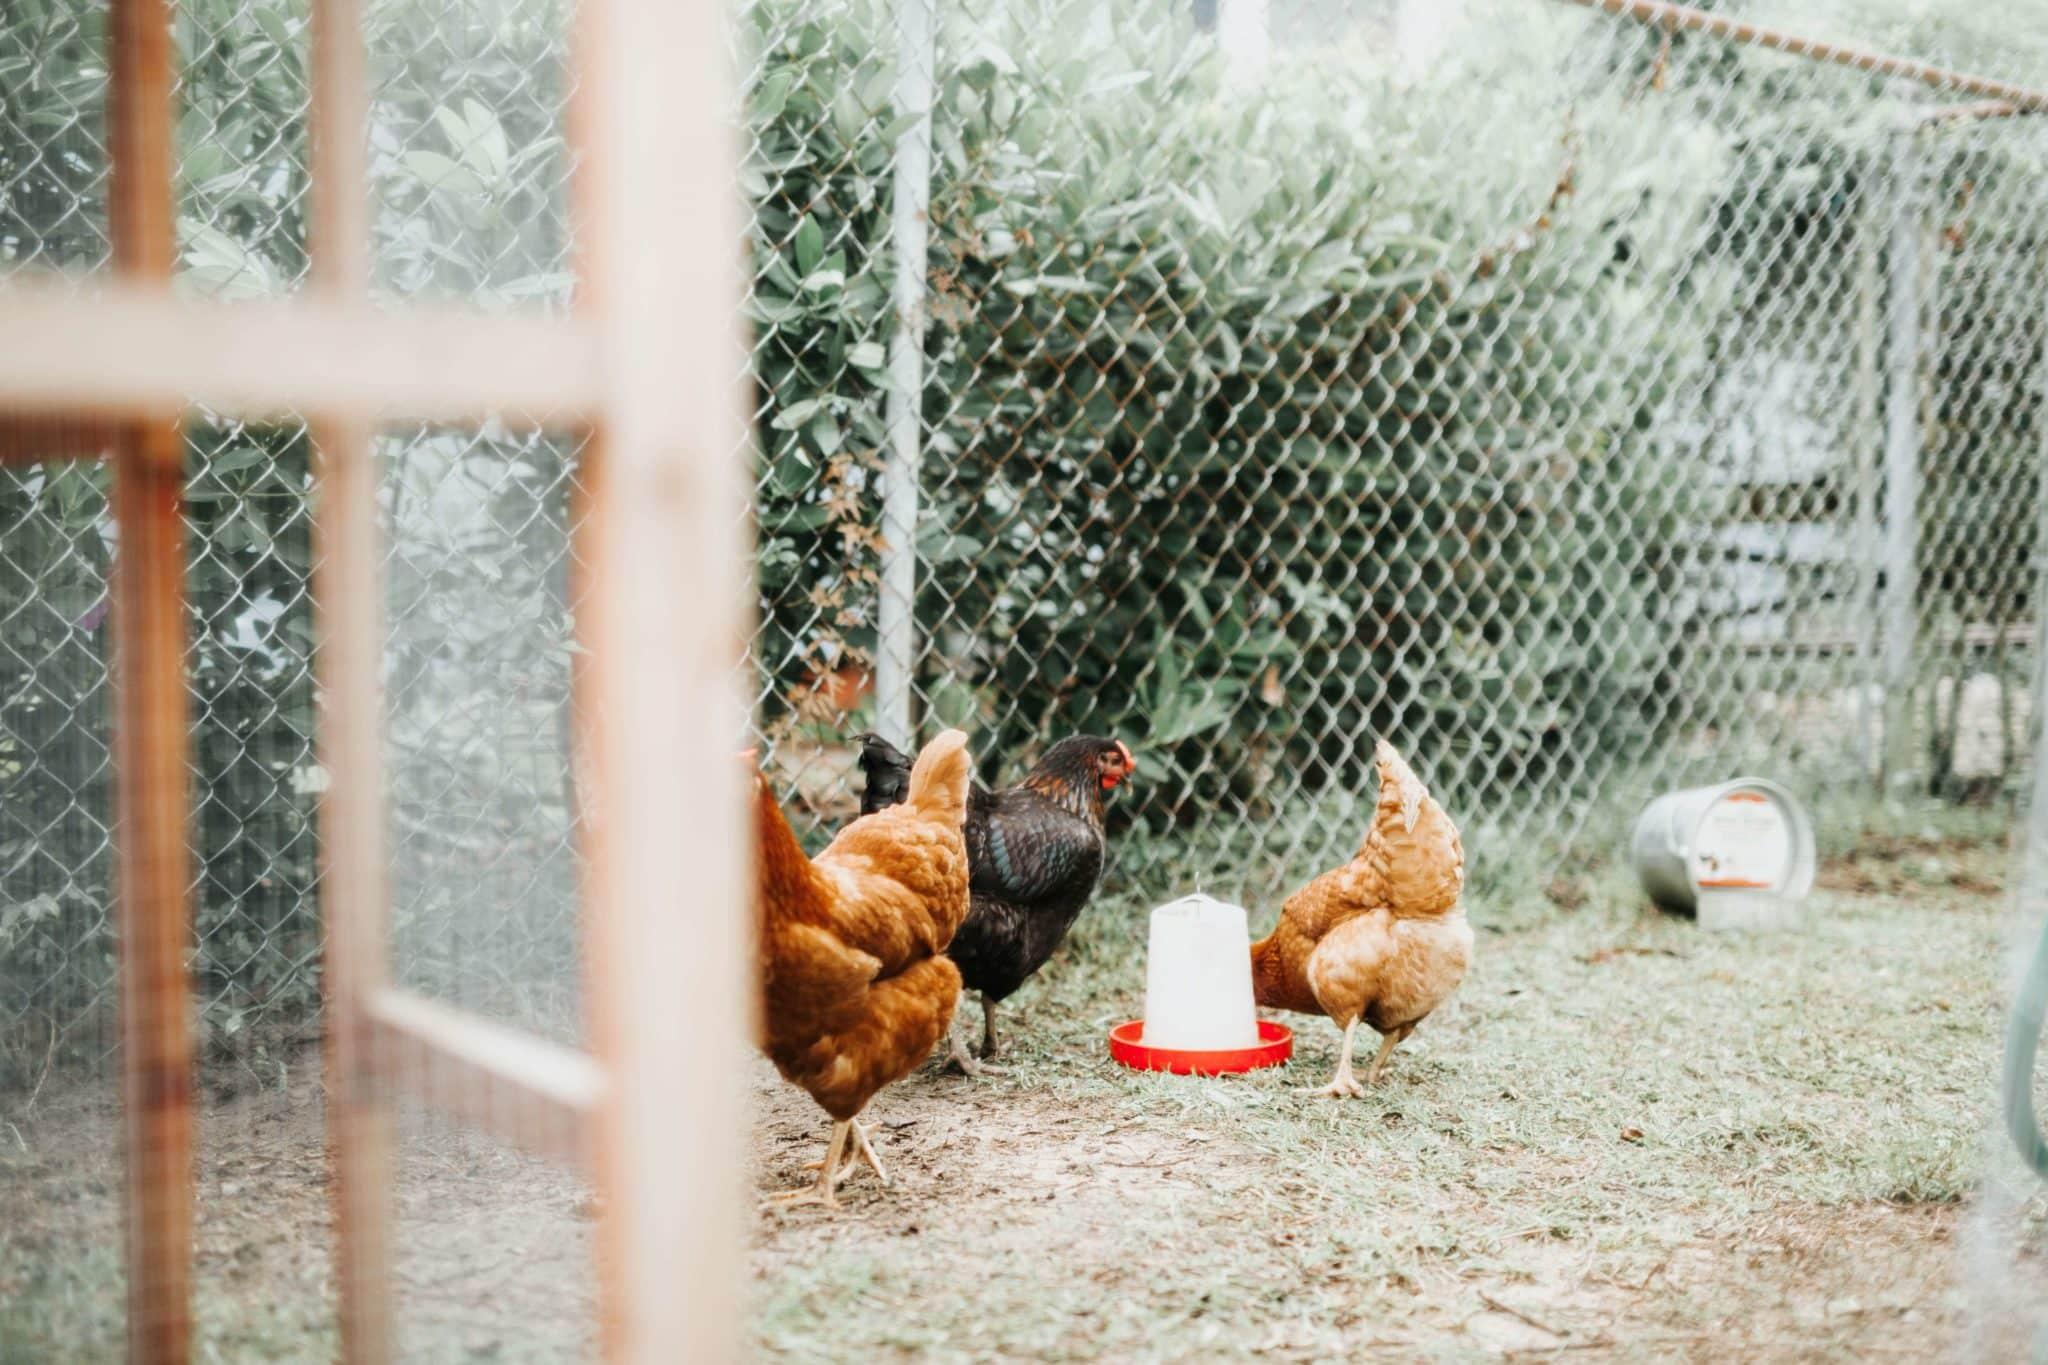 The Best Automatic Chicken Feeders; Chicken Waterers - Chicken Keeping Secrets